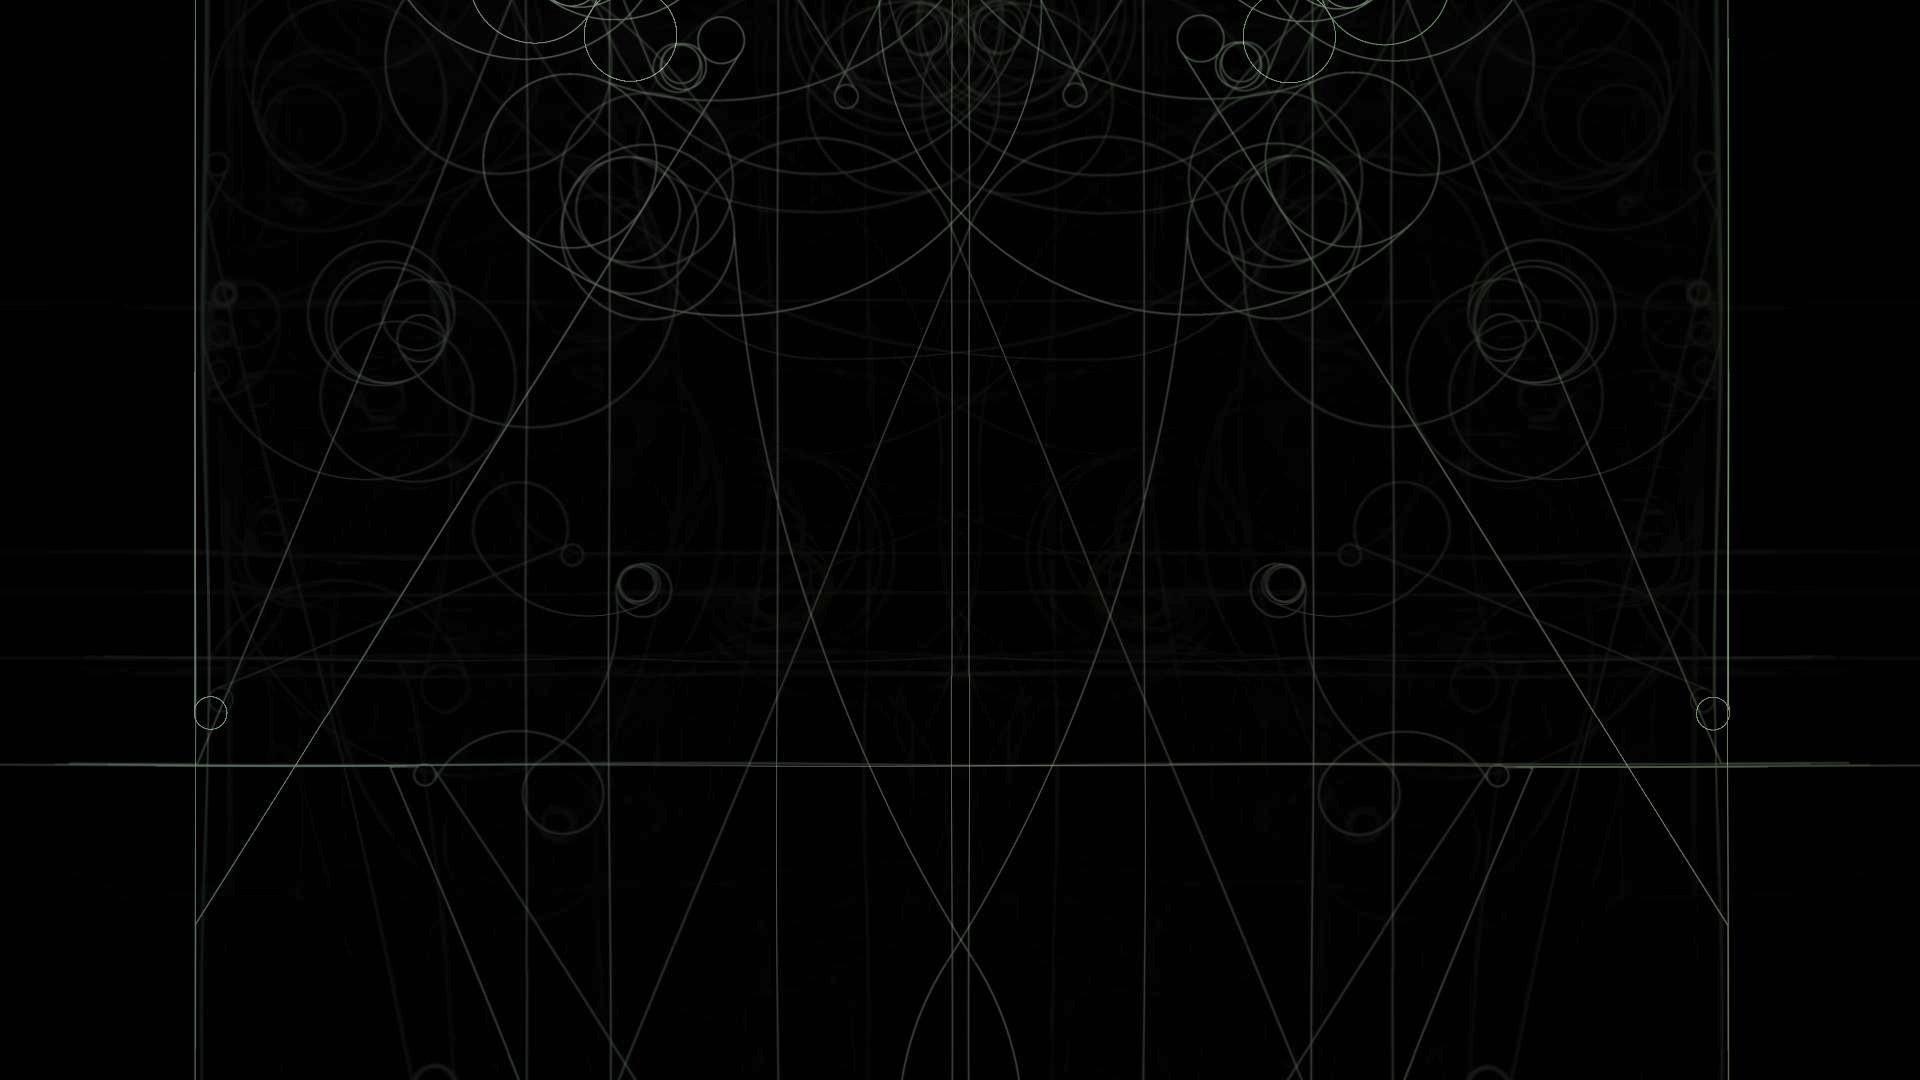 Black Wallpaper 1920x1080 (76+ images)